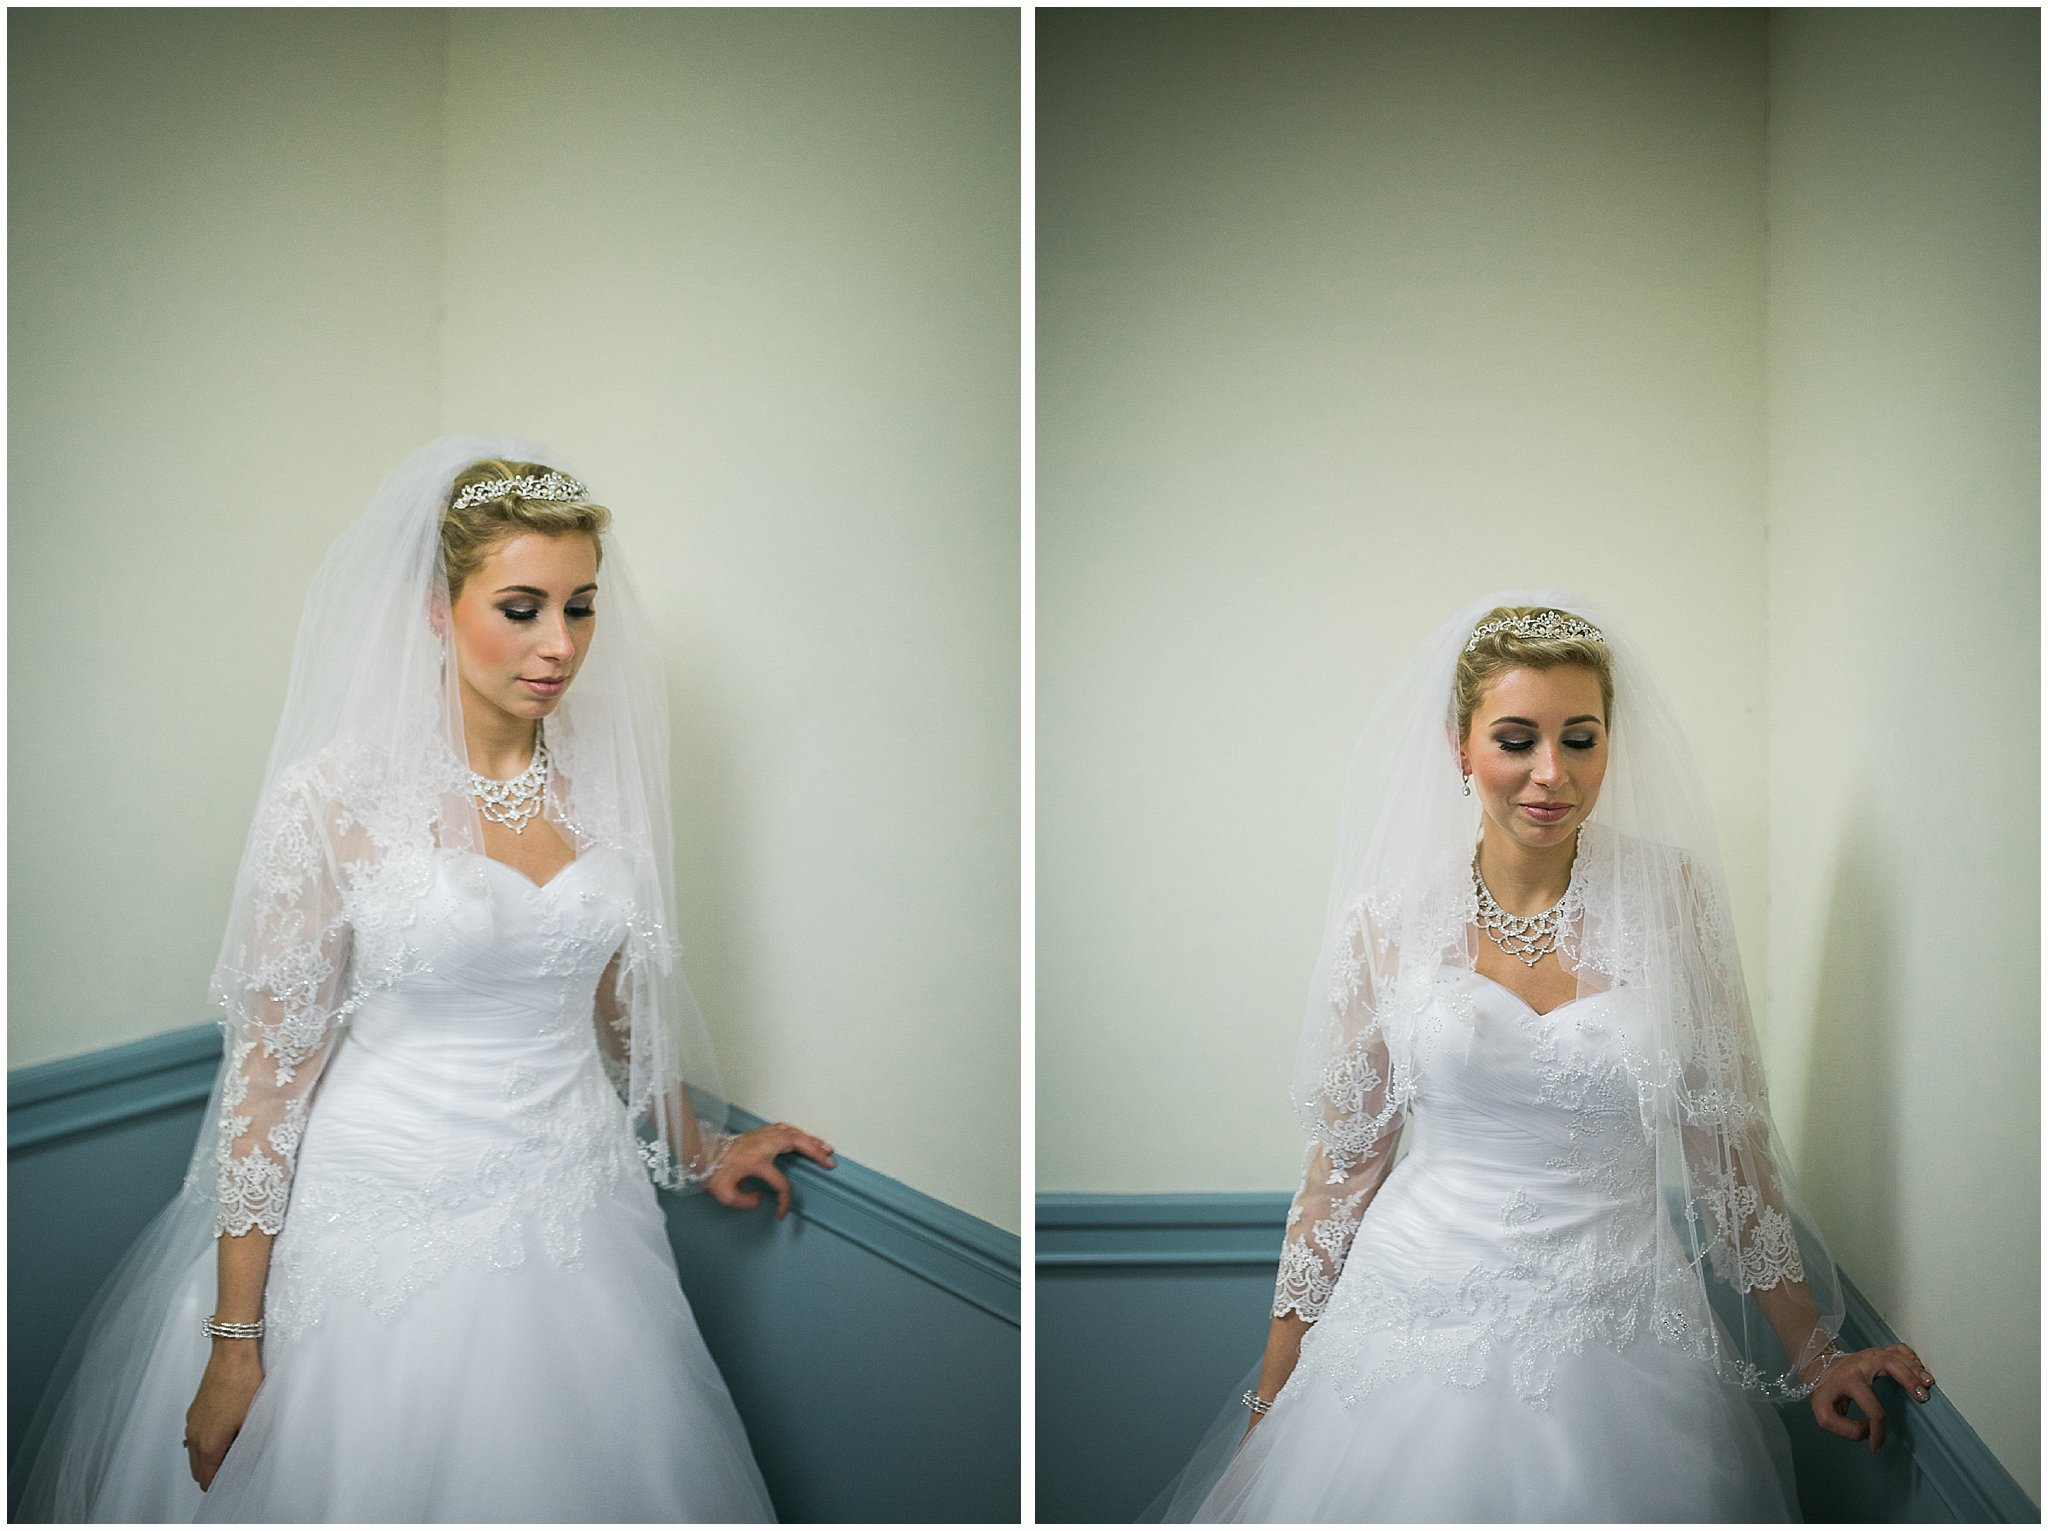 Wollaston Church of the Nazarene Wedding Boston Wedding Photographer10.jpg